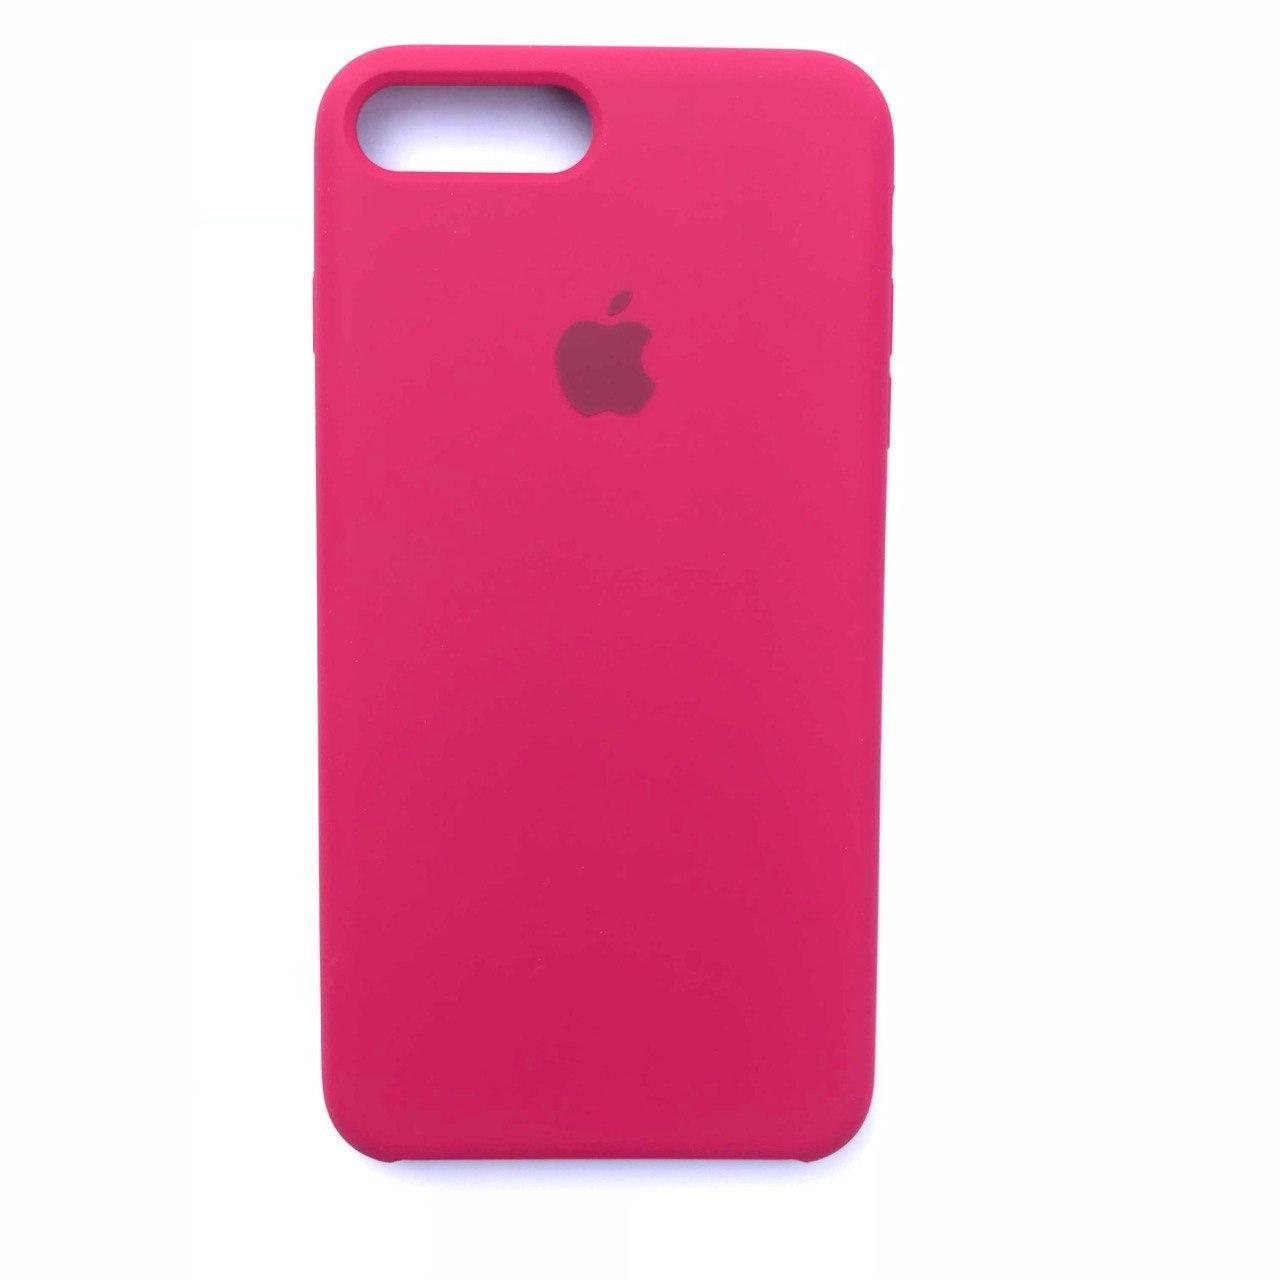 Чехол-накладка Silicone Case для Apple iPhone 7 Plus iPhone 8 Plus Rose Red